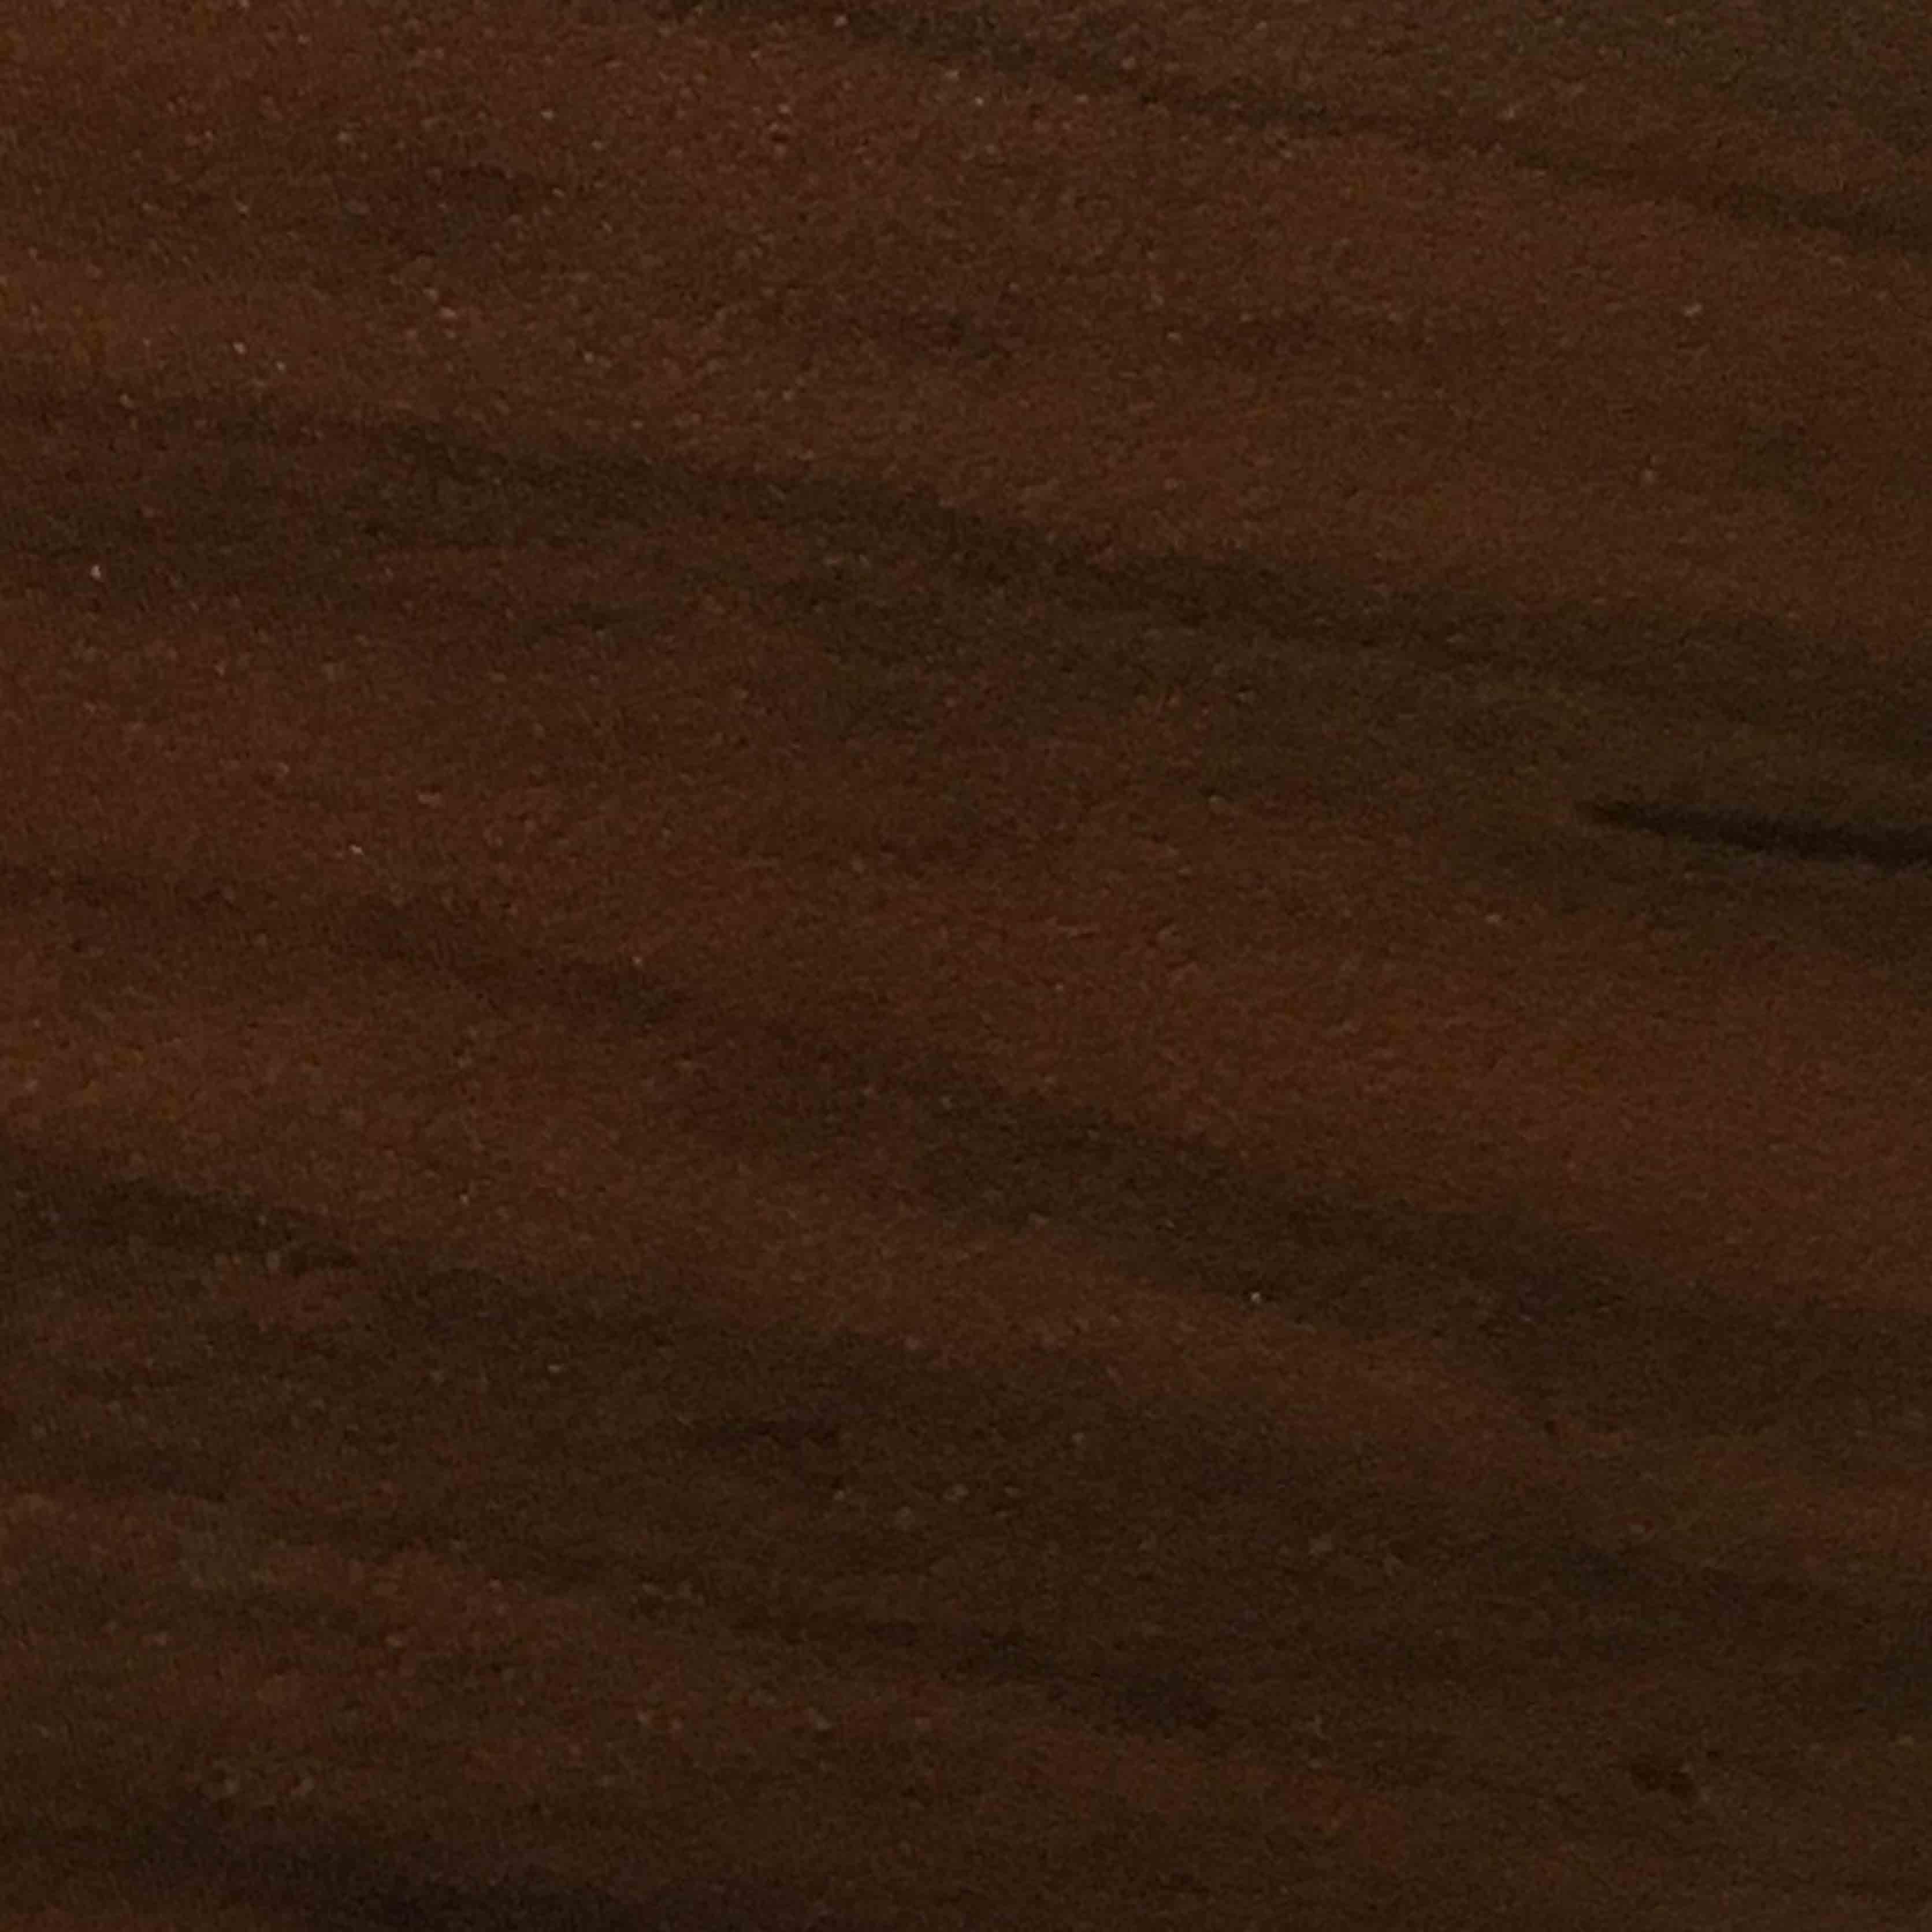 Decal vân gỗ - 3903